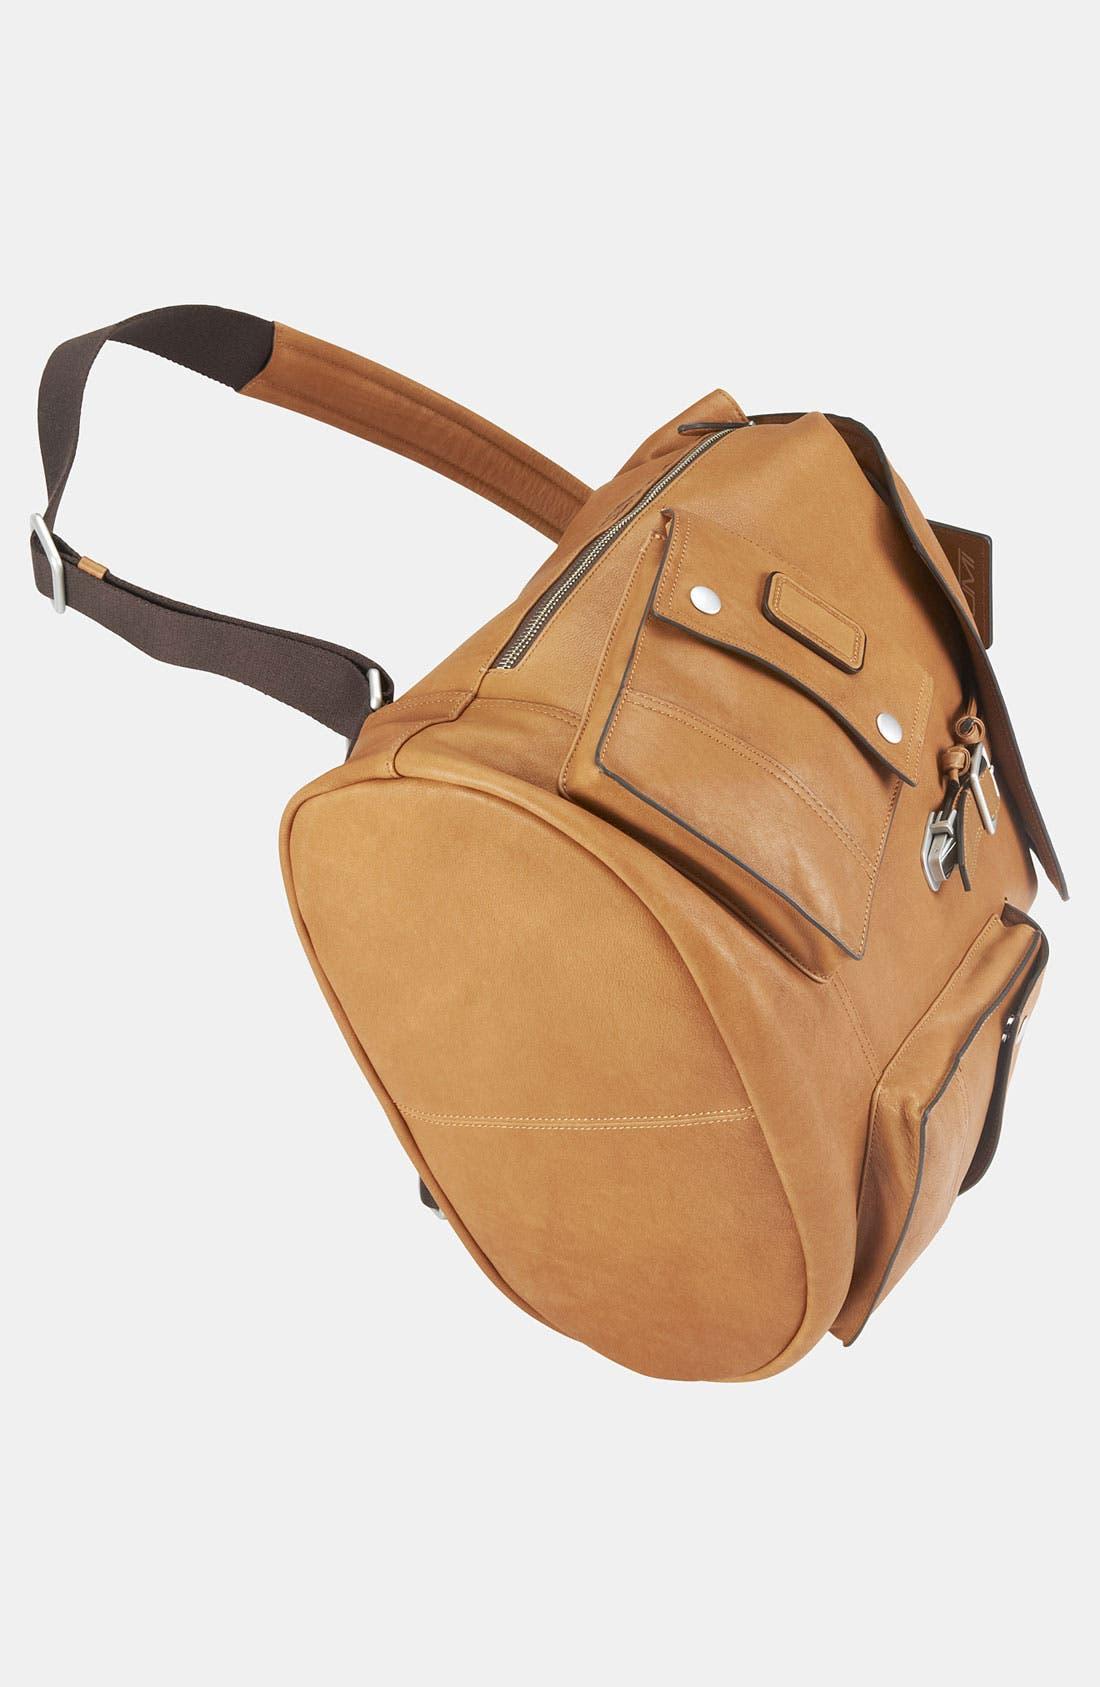 'Ducati Retro - Scrambler' Backpack,                             Alternate thumbnail 2, color,                             219